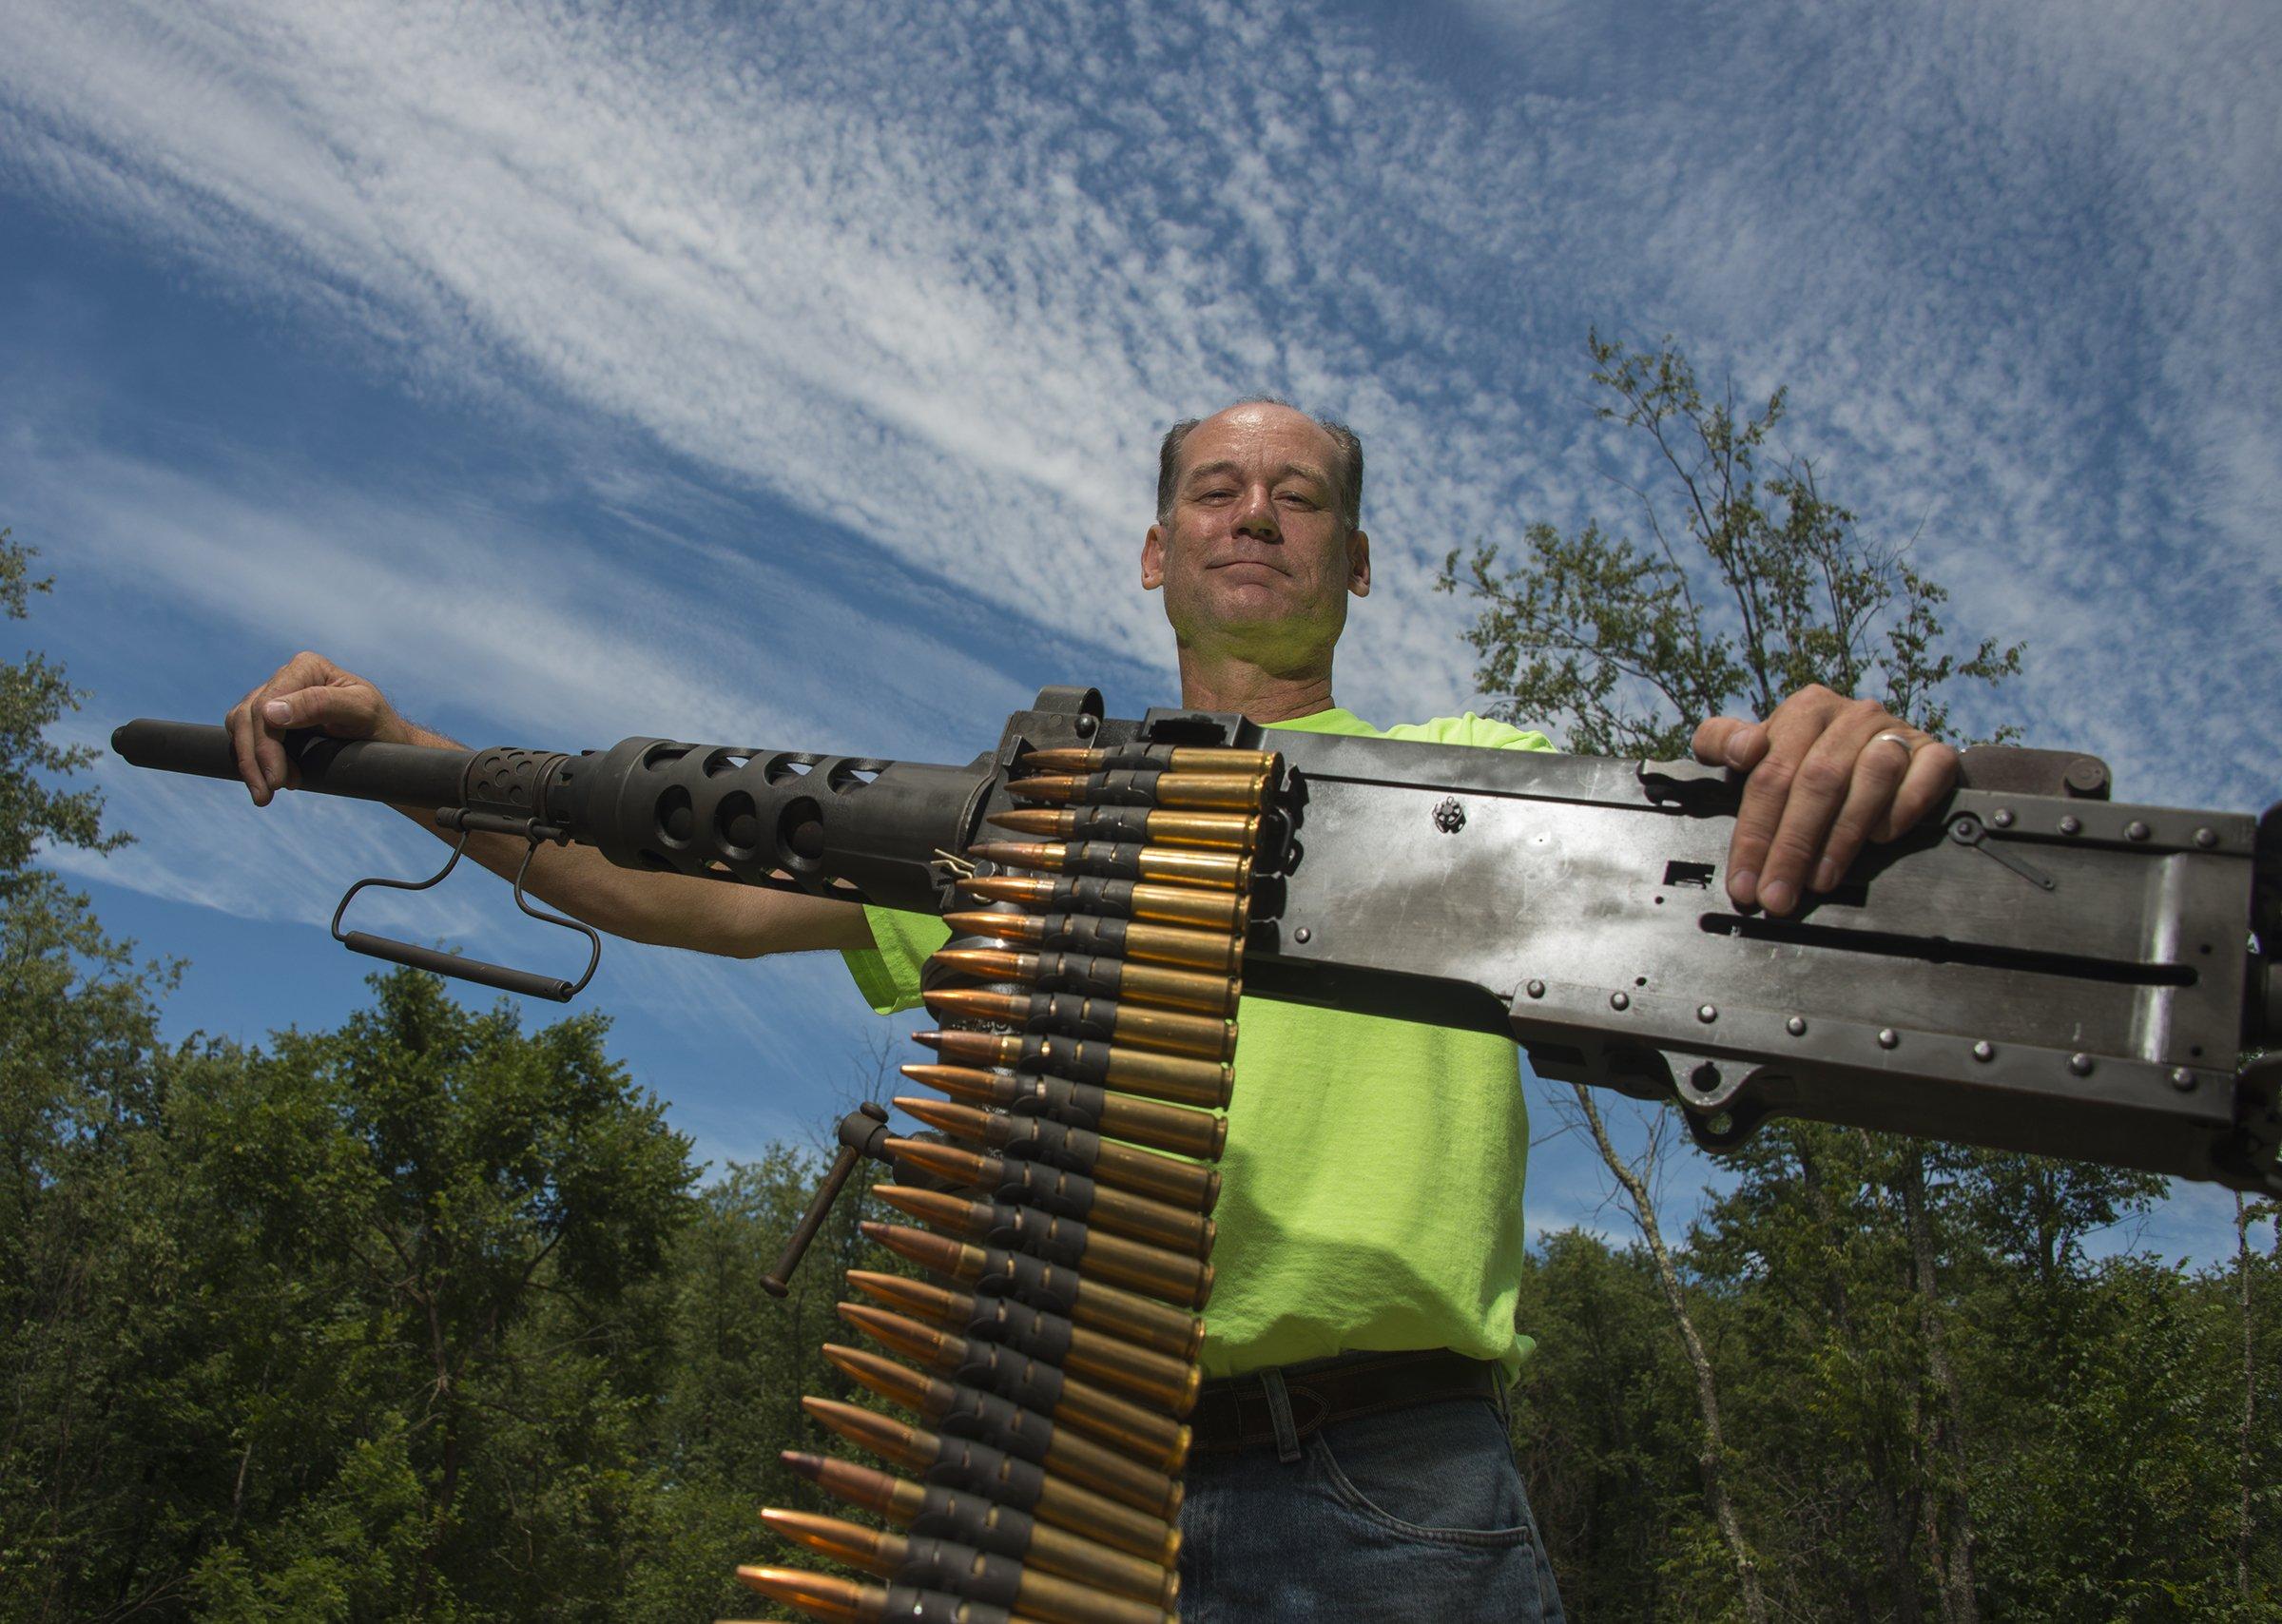 Range provides 'thrill' of renting machine guns